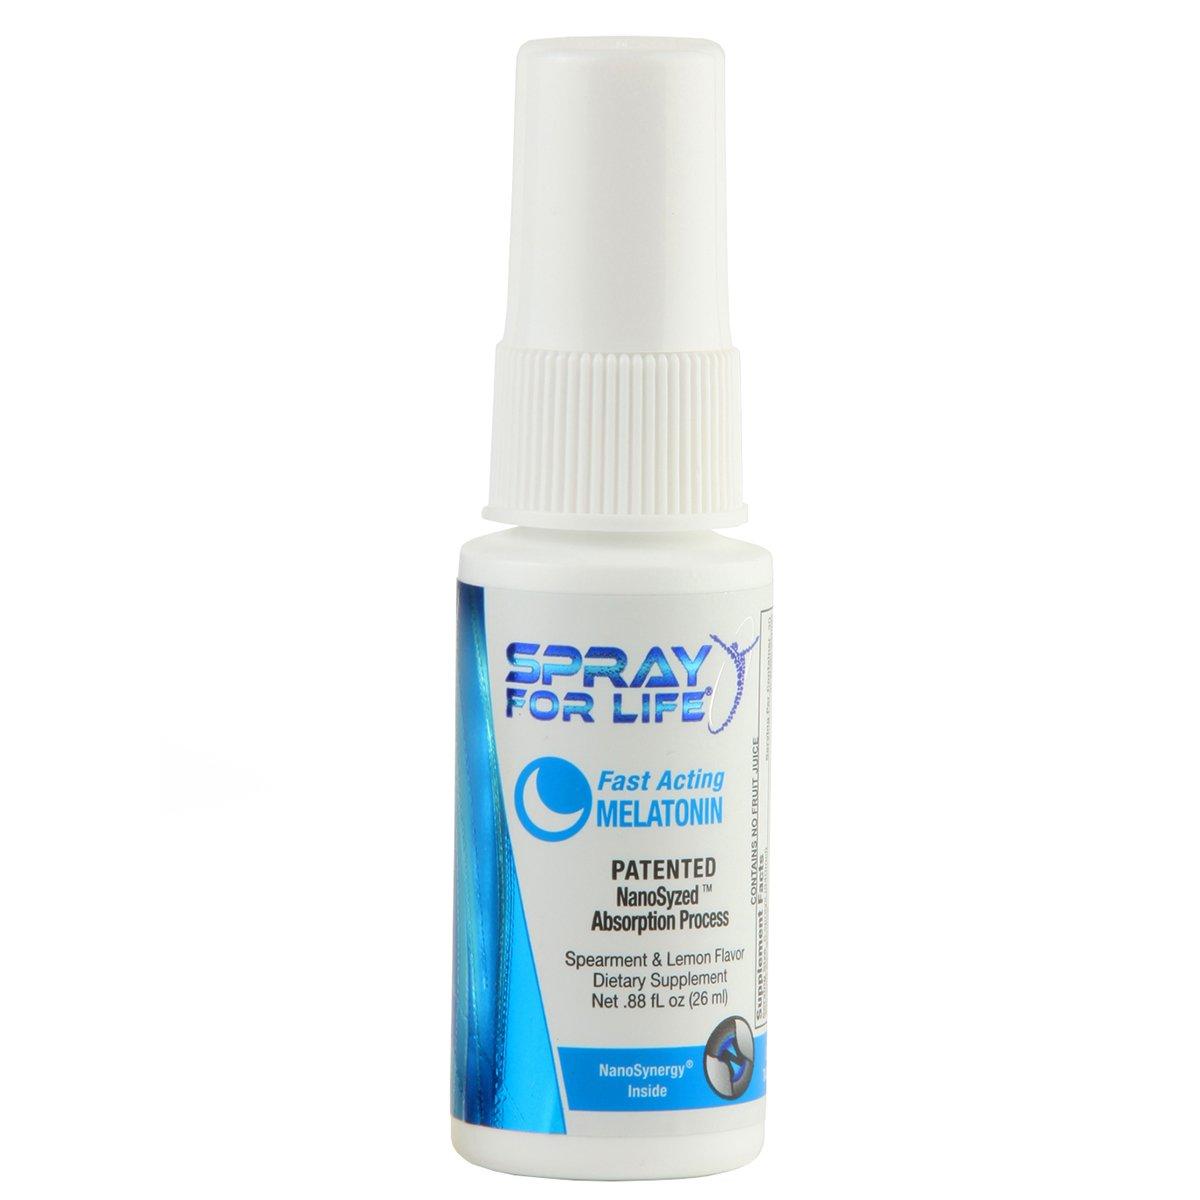 Spray for Life Melatonin Spray with Nanotechnology for Improved Sleep Guaranteed 1oz - Spearmint & Lemon - 30 Day Supply